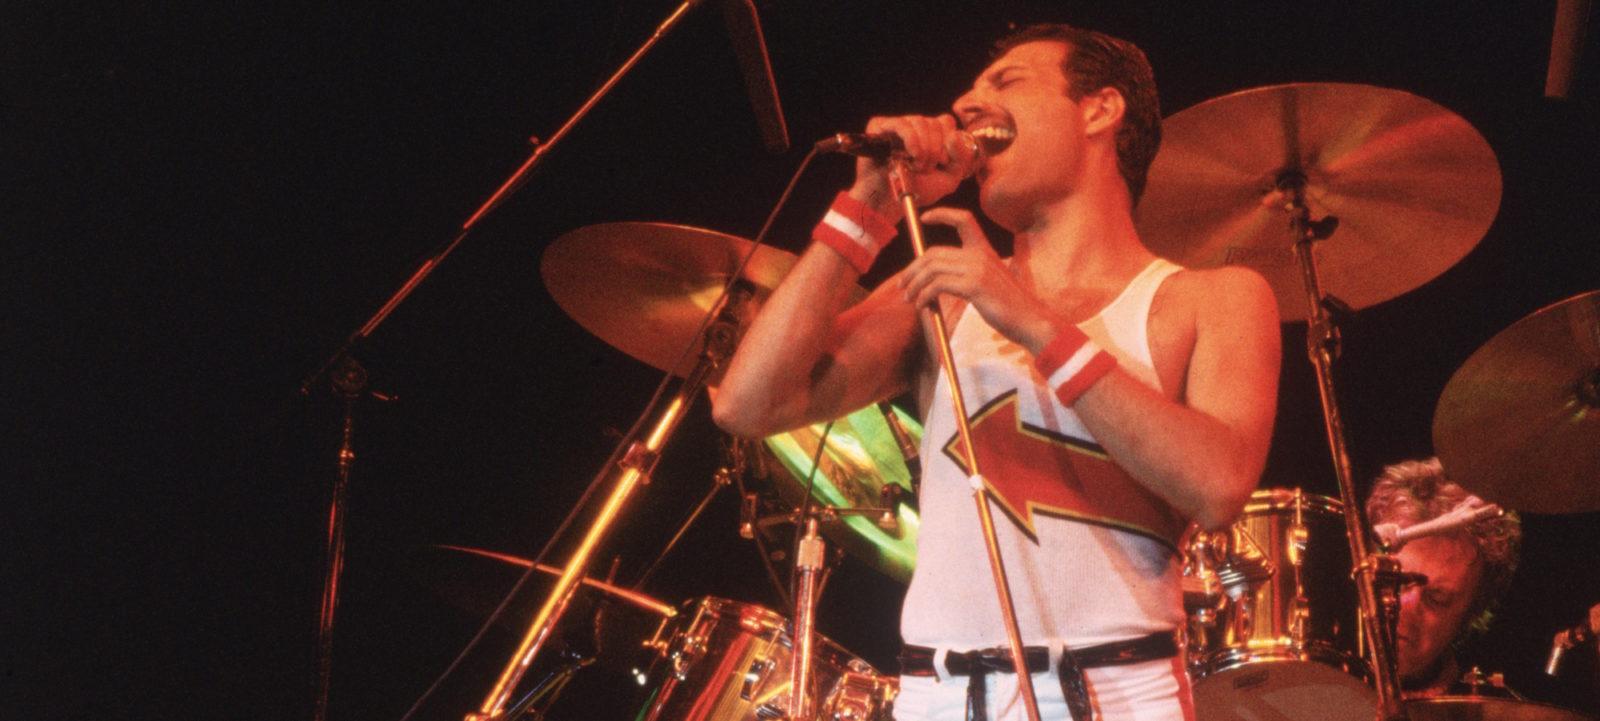 5th June 1982:  Freddie Mercury (1946 – 1991), lead singer of 70s hard rock quartet Queen, in concert in Milton Keynes.